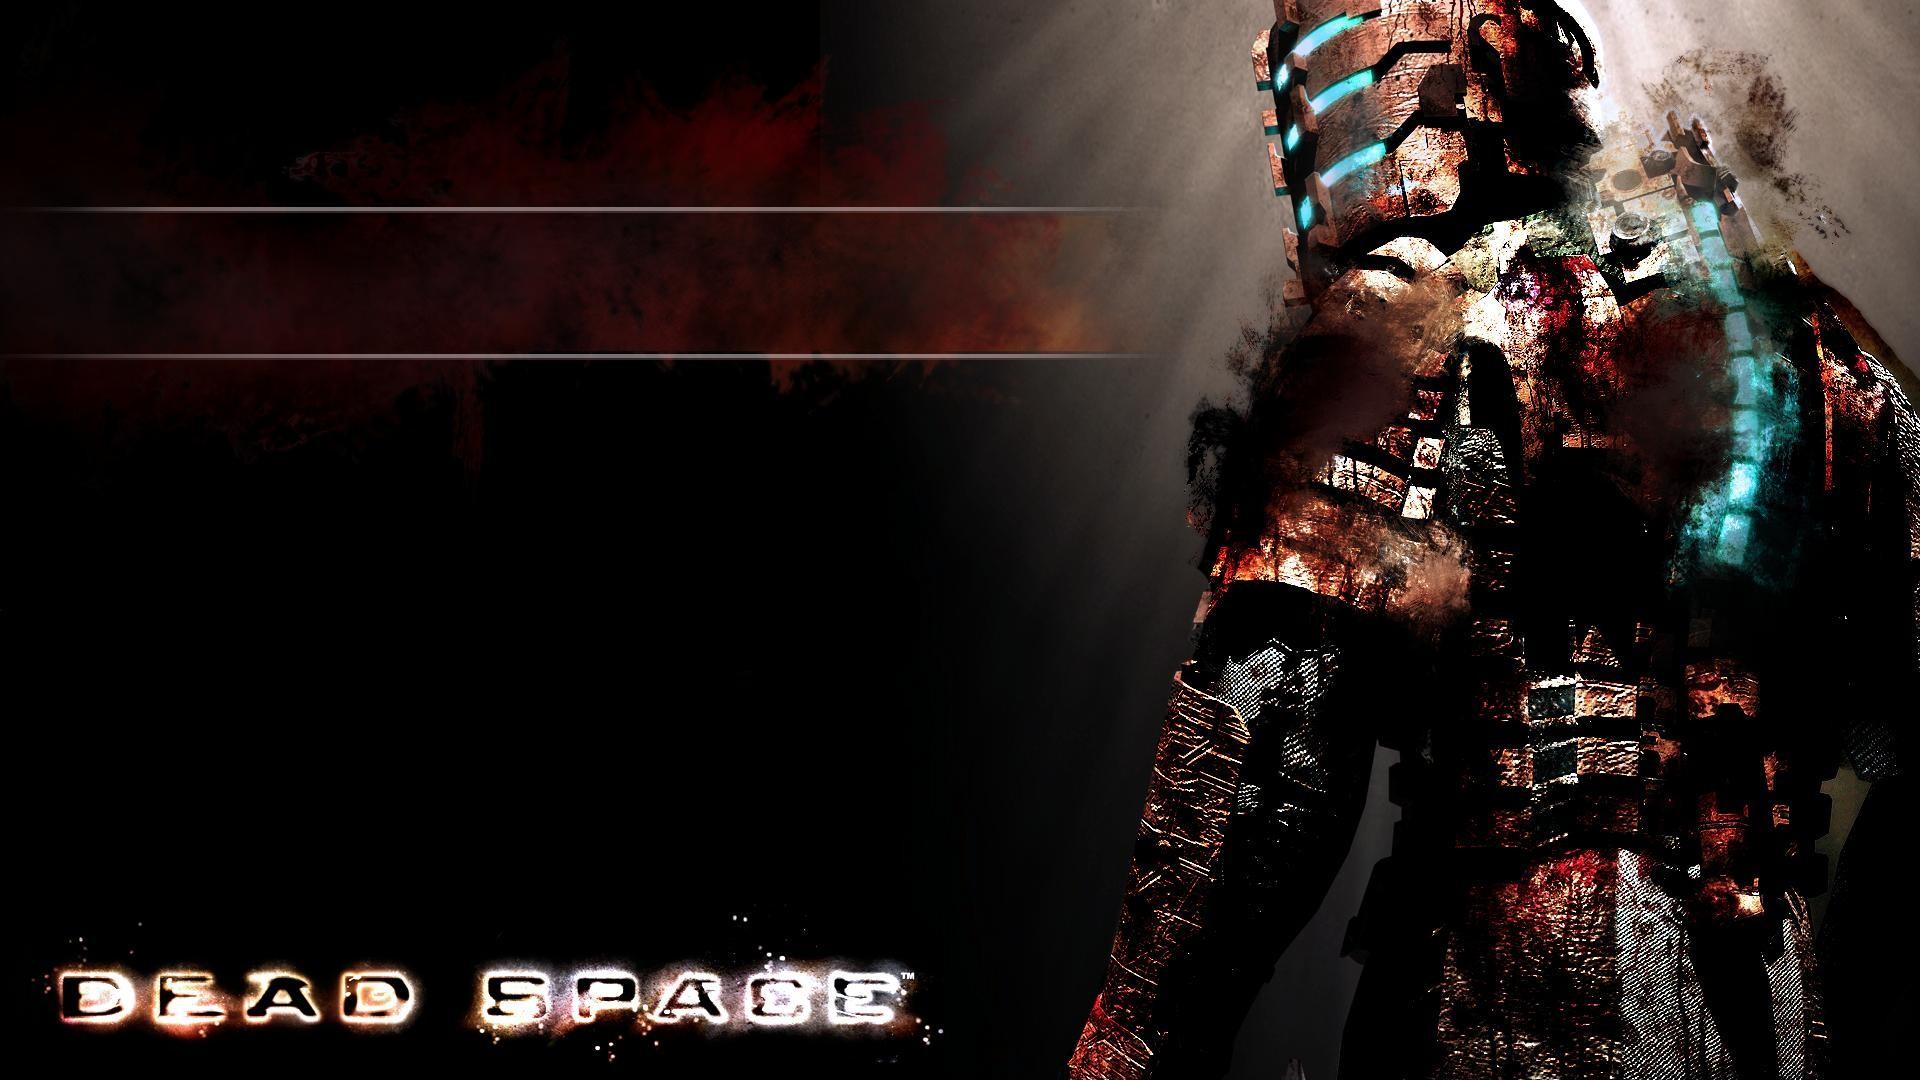 Dead Space HD Wallpapers Backgrounds Wallpaper